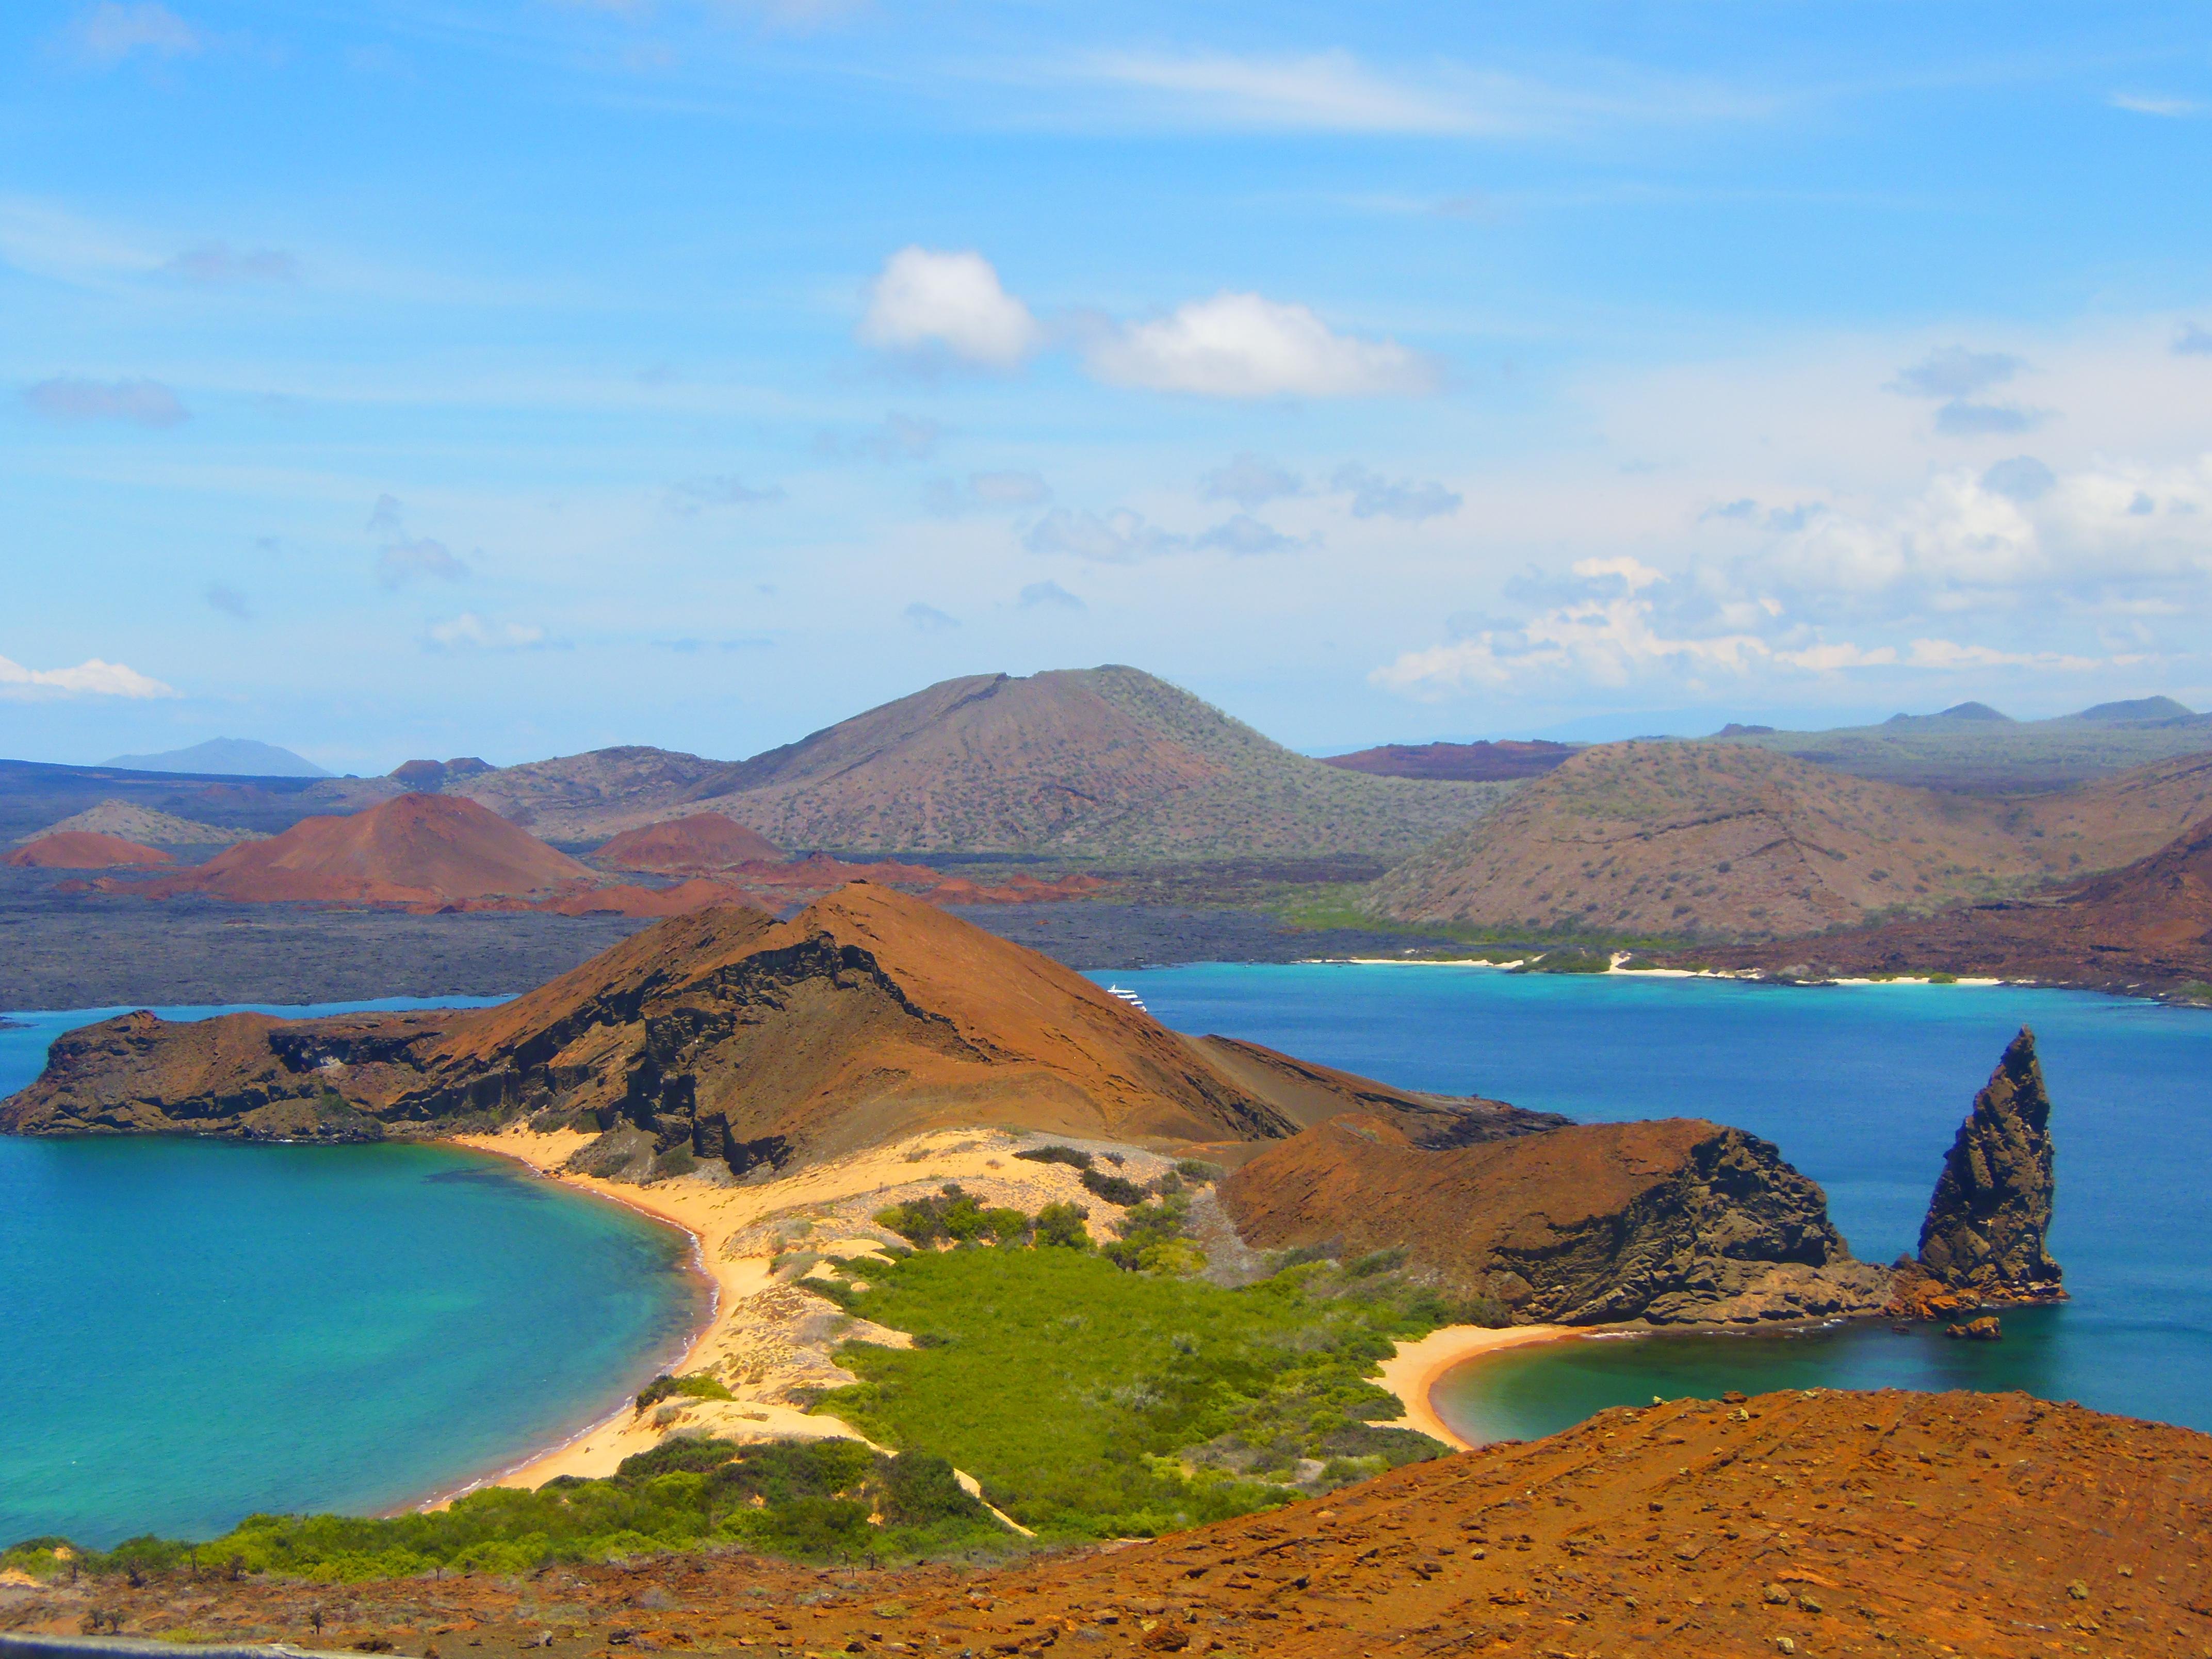 Galapagos Cruise packing list tours